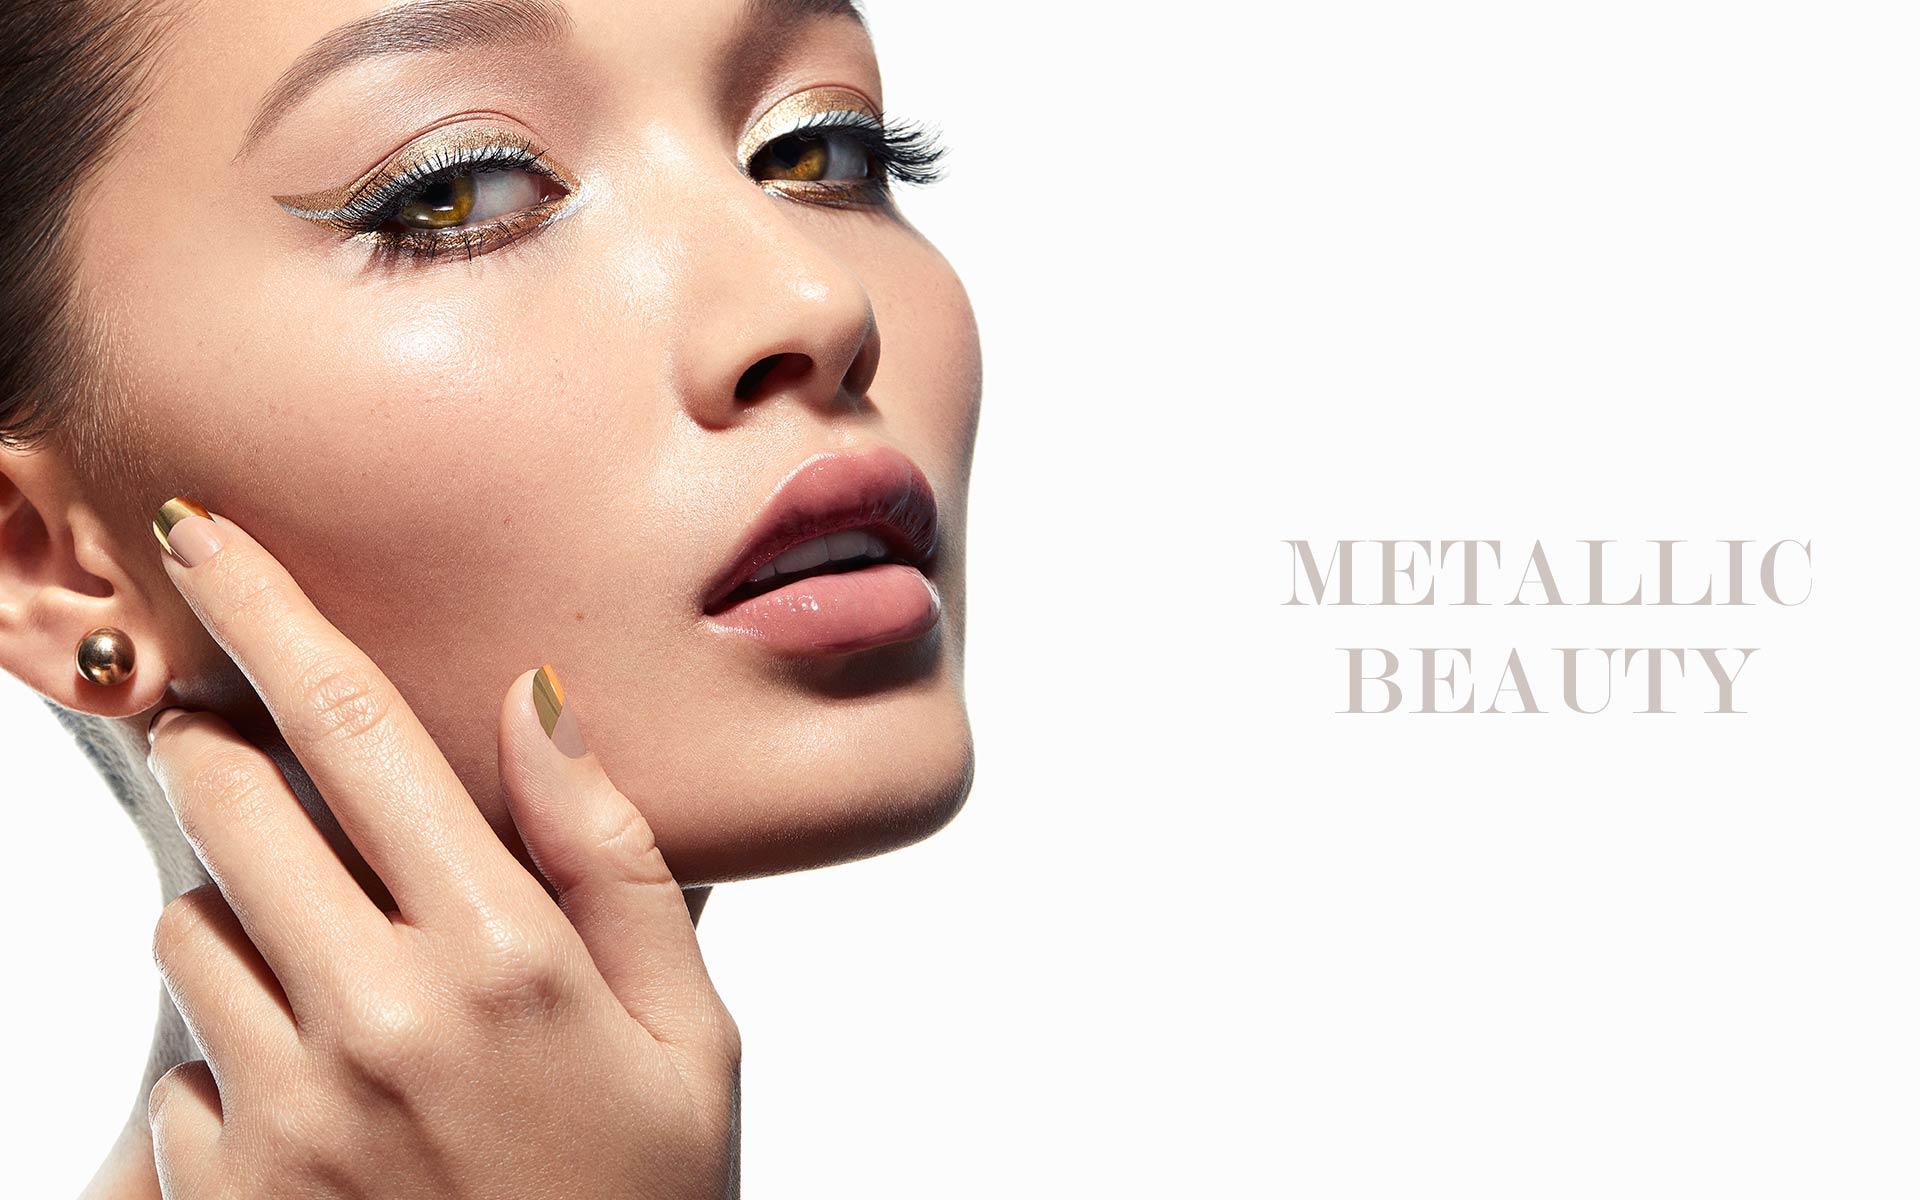 metallic_beauty_editorial3